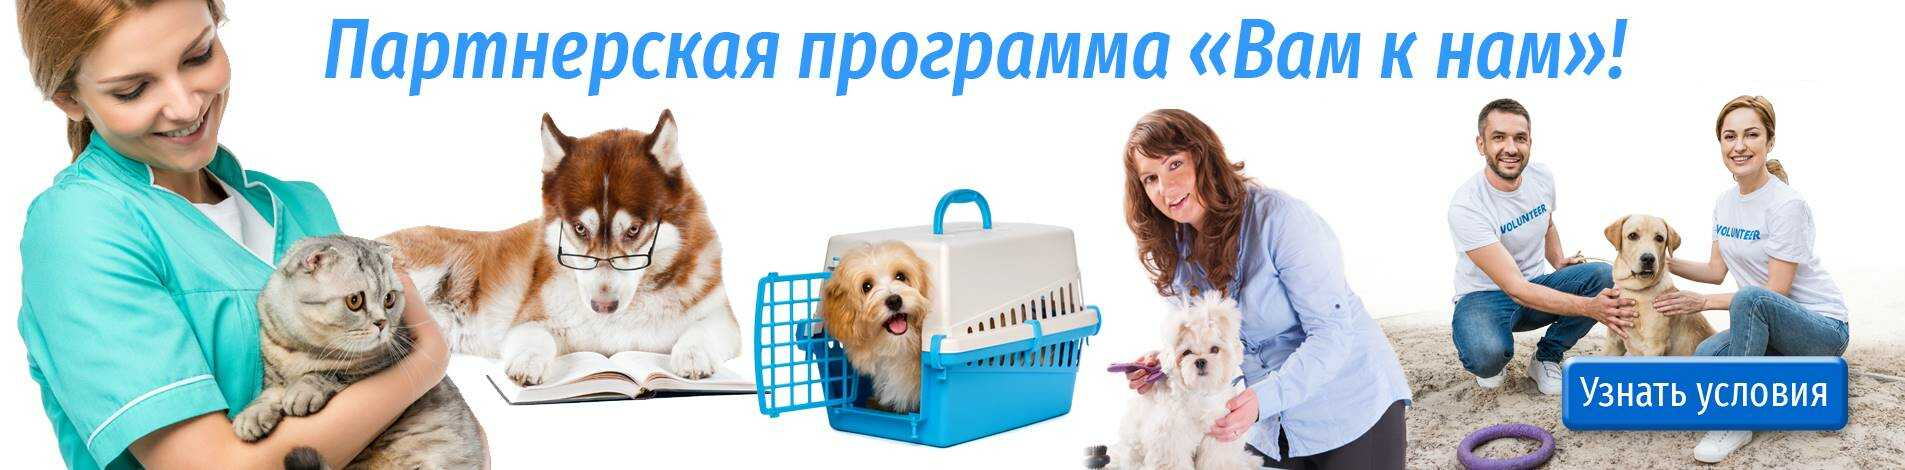 Вам+к+намjpc_optimized